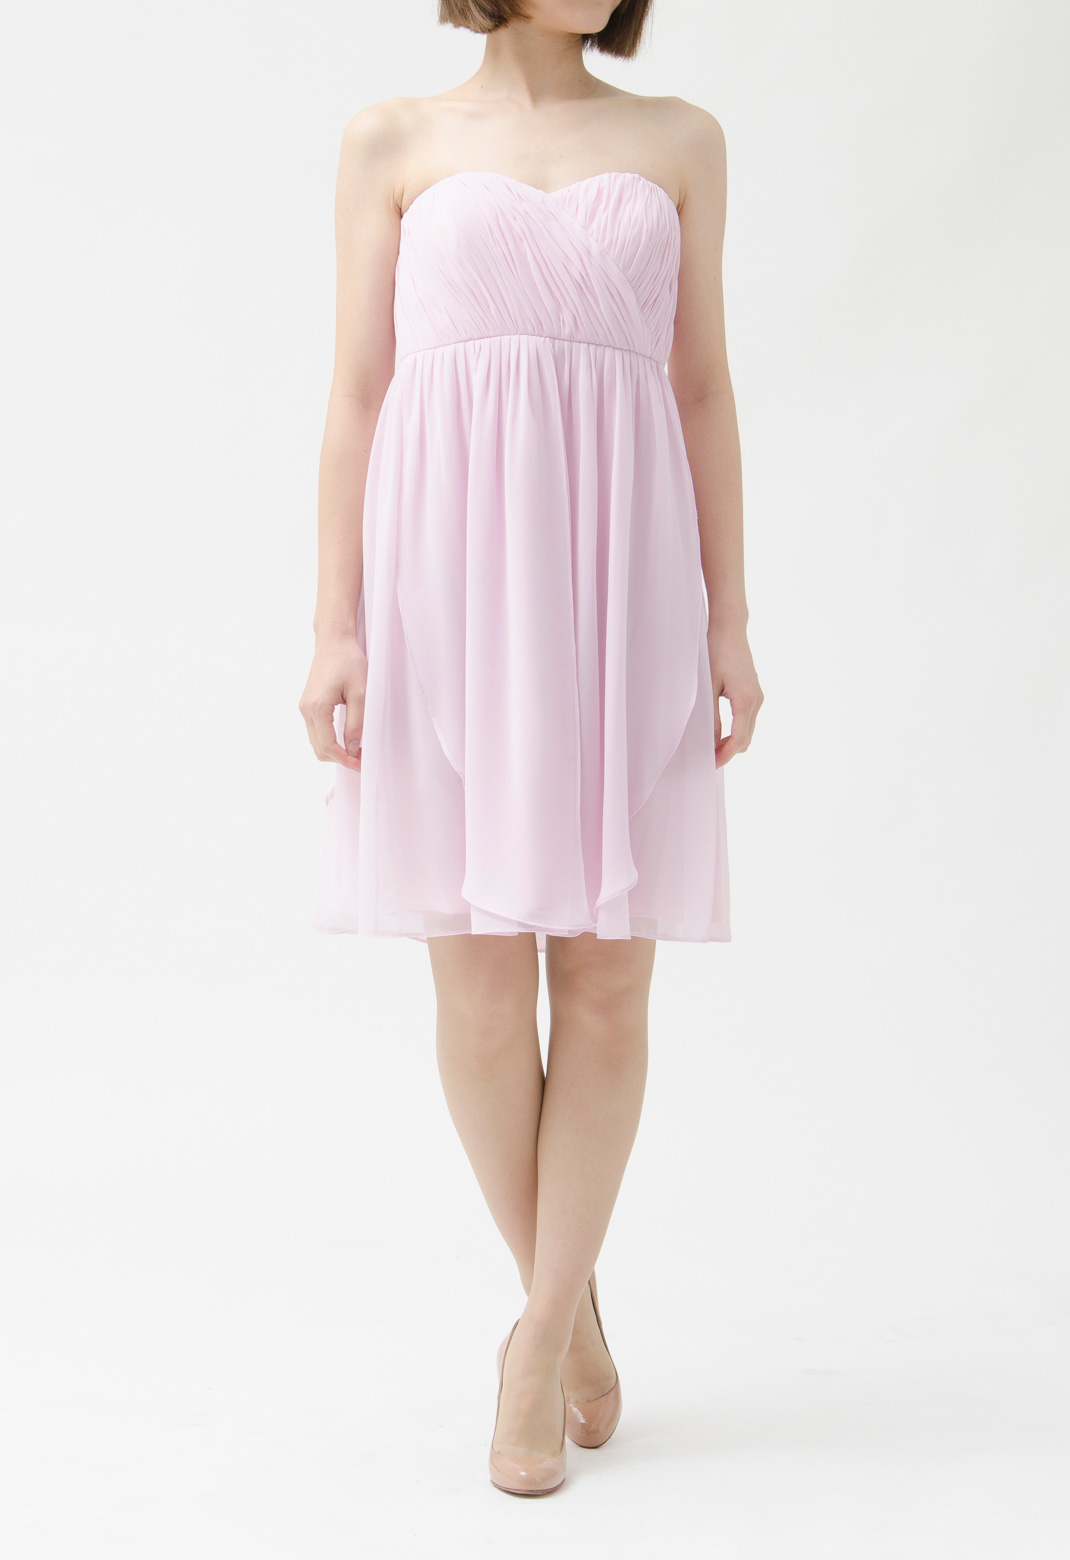 3way ストラップレス ドレス【ブライズメイド】